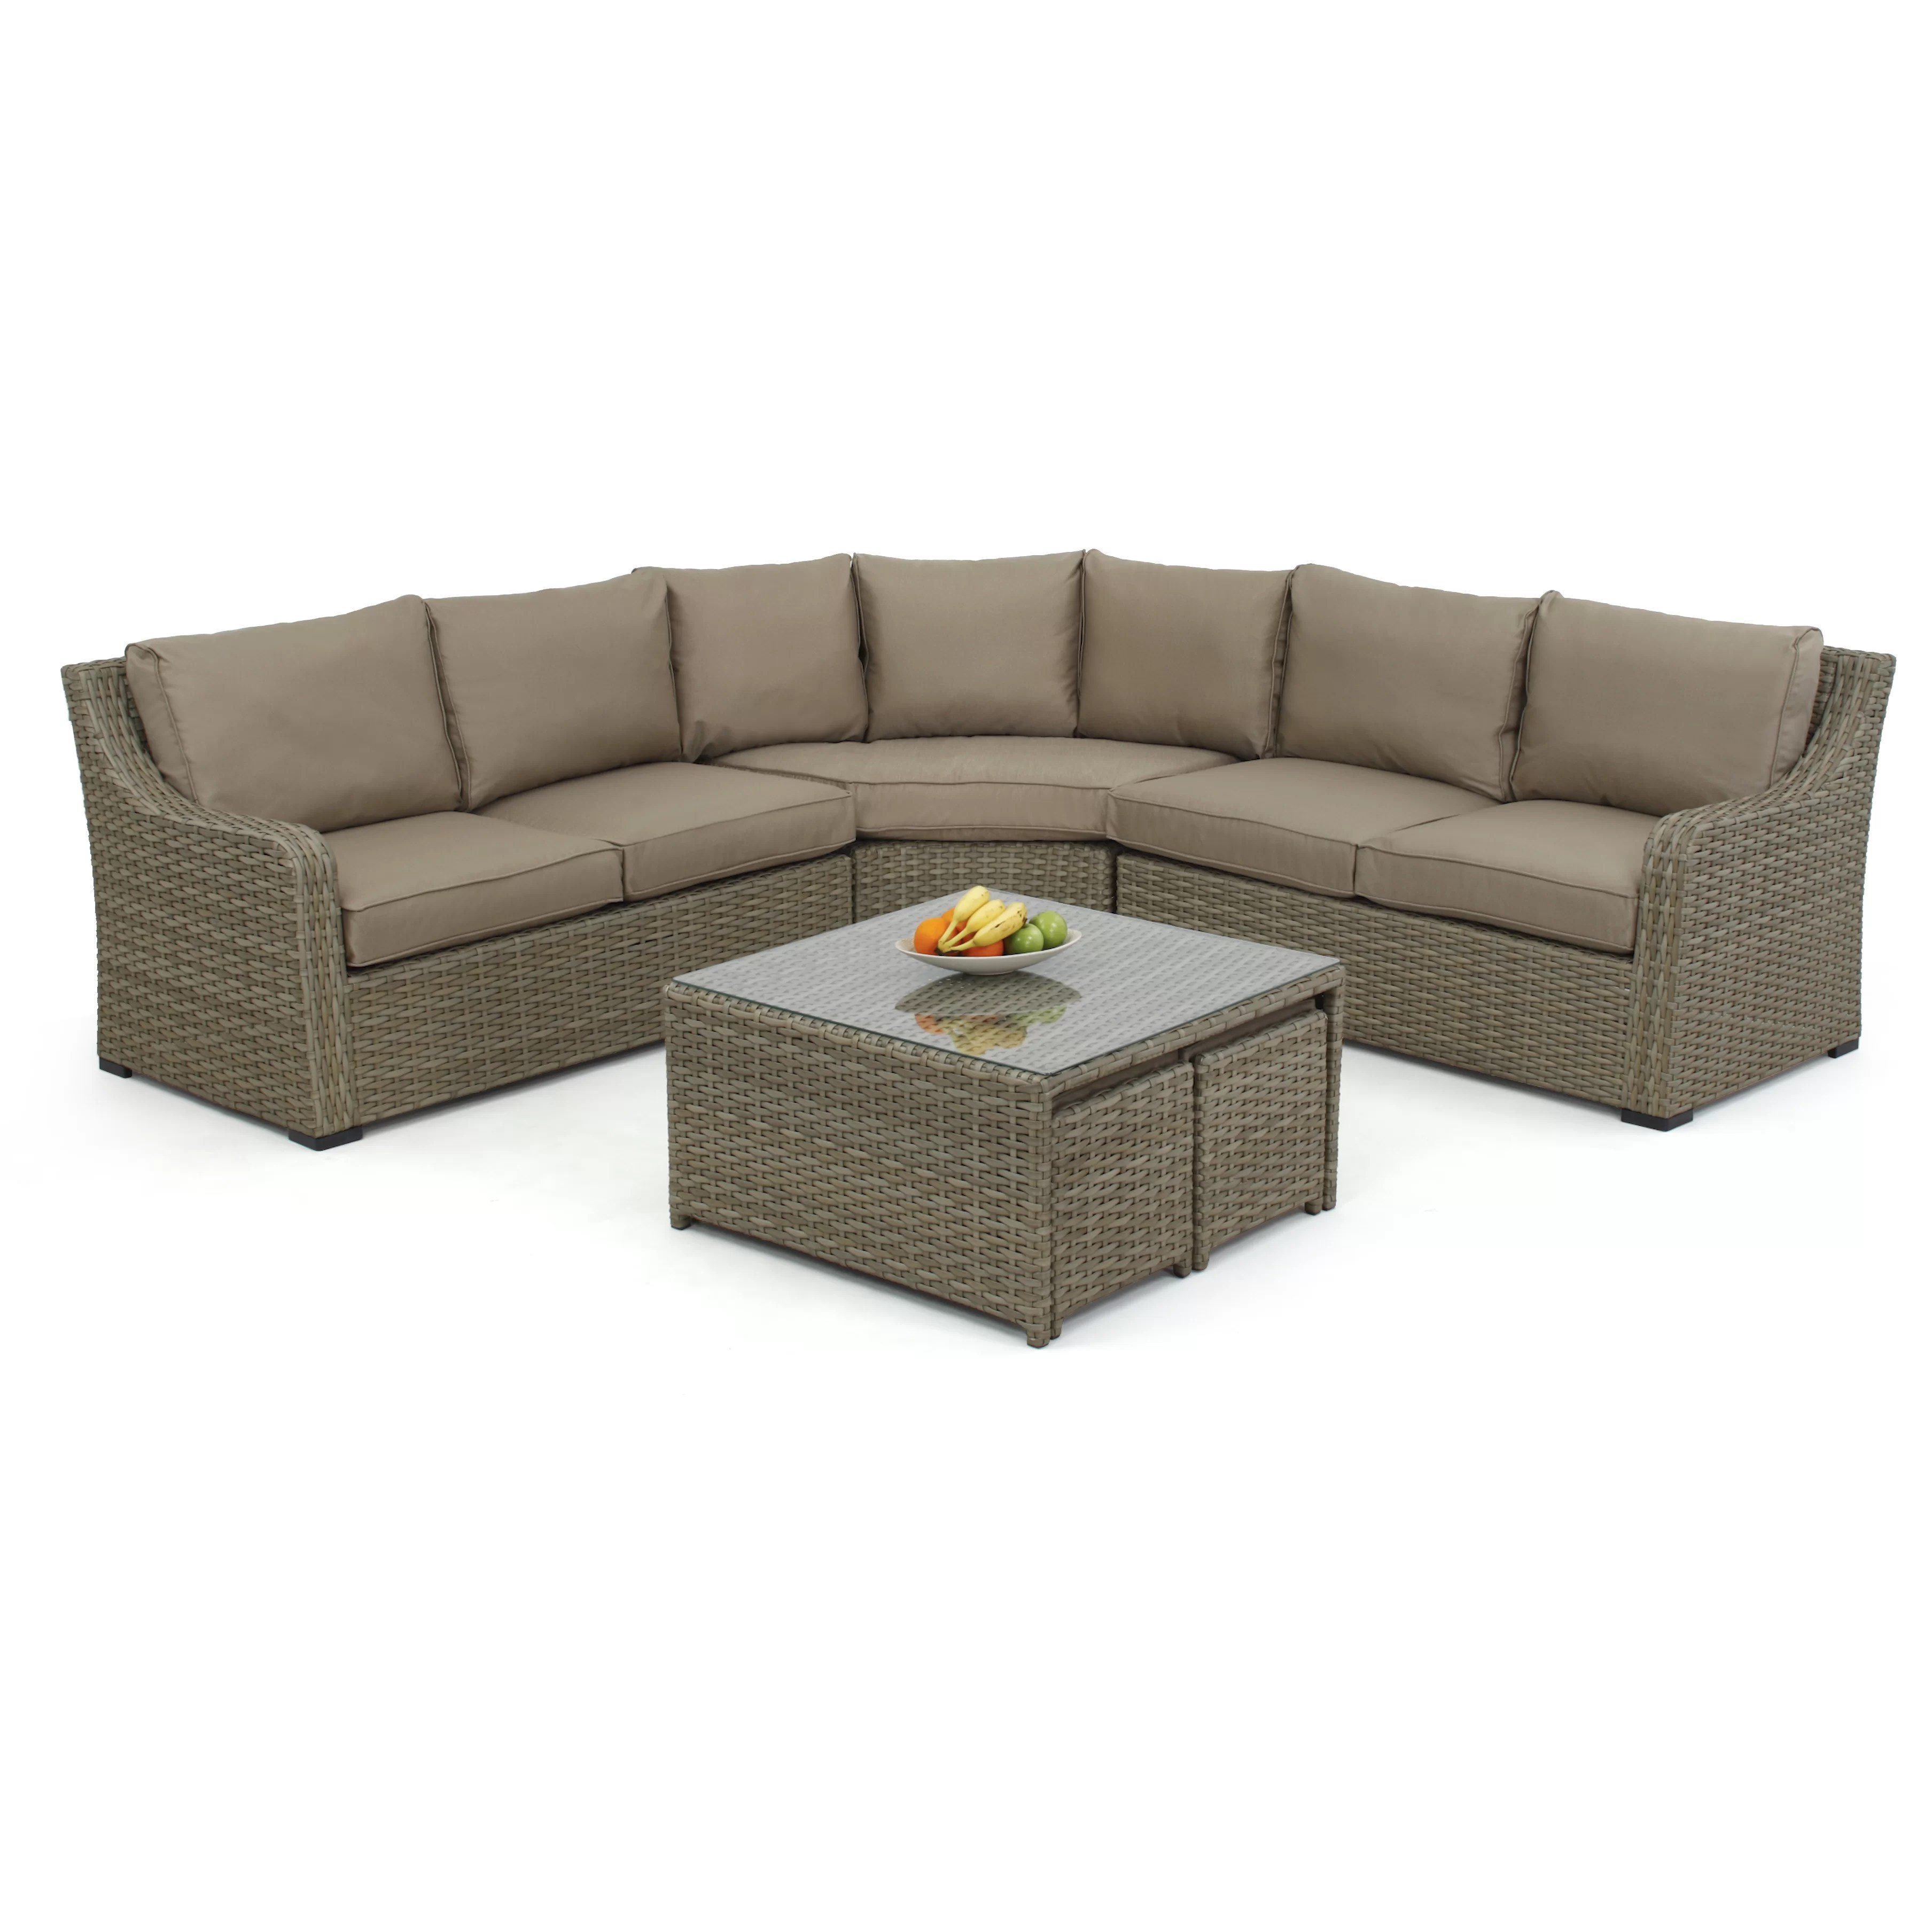 Sofa Set 7 Seater Online